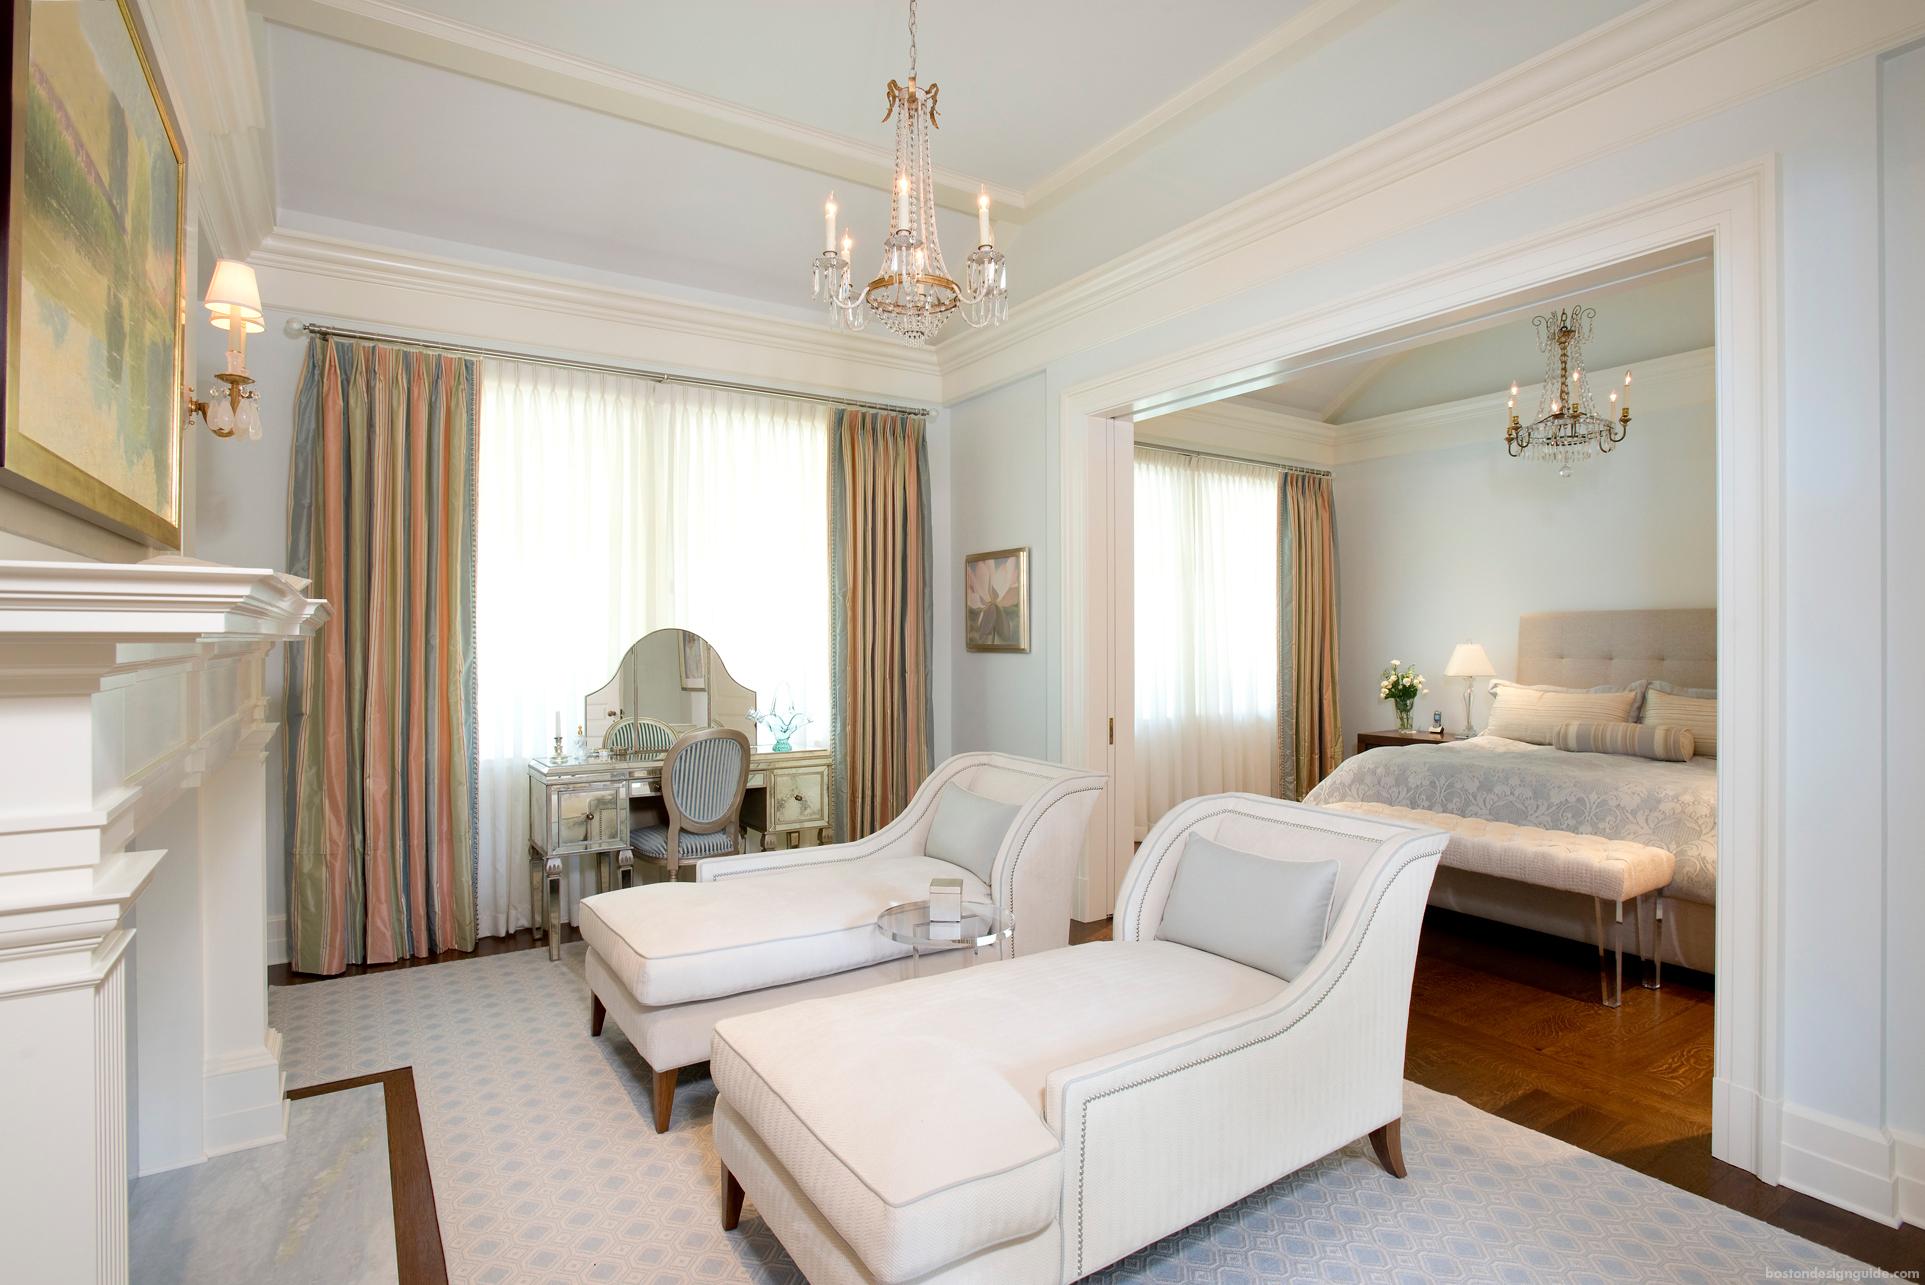 Luxury Home Interior Design Trends High End Fashion